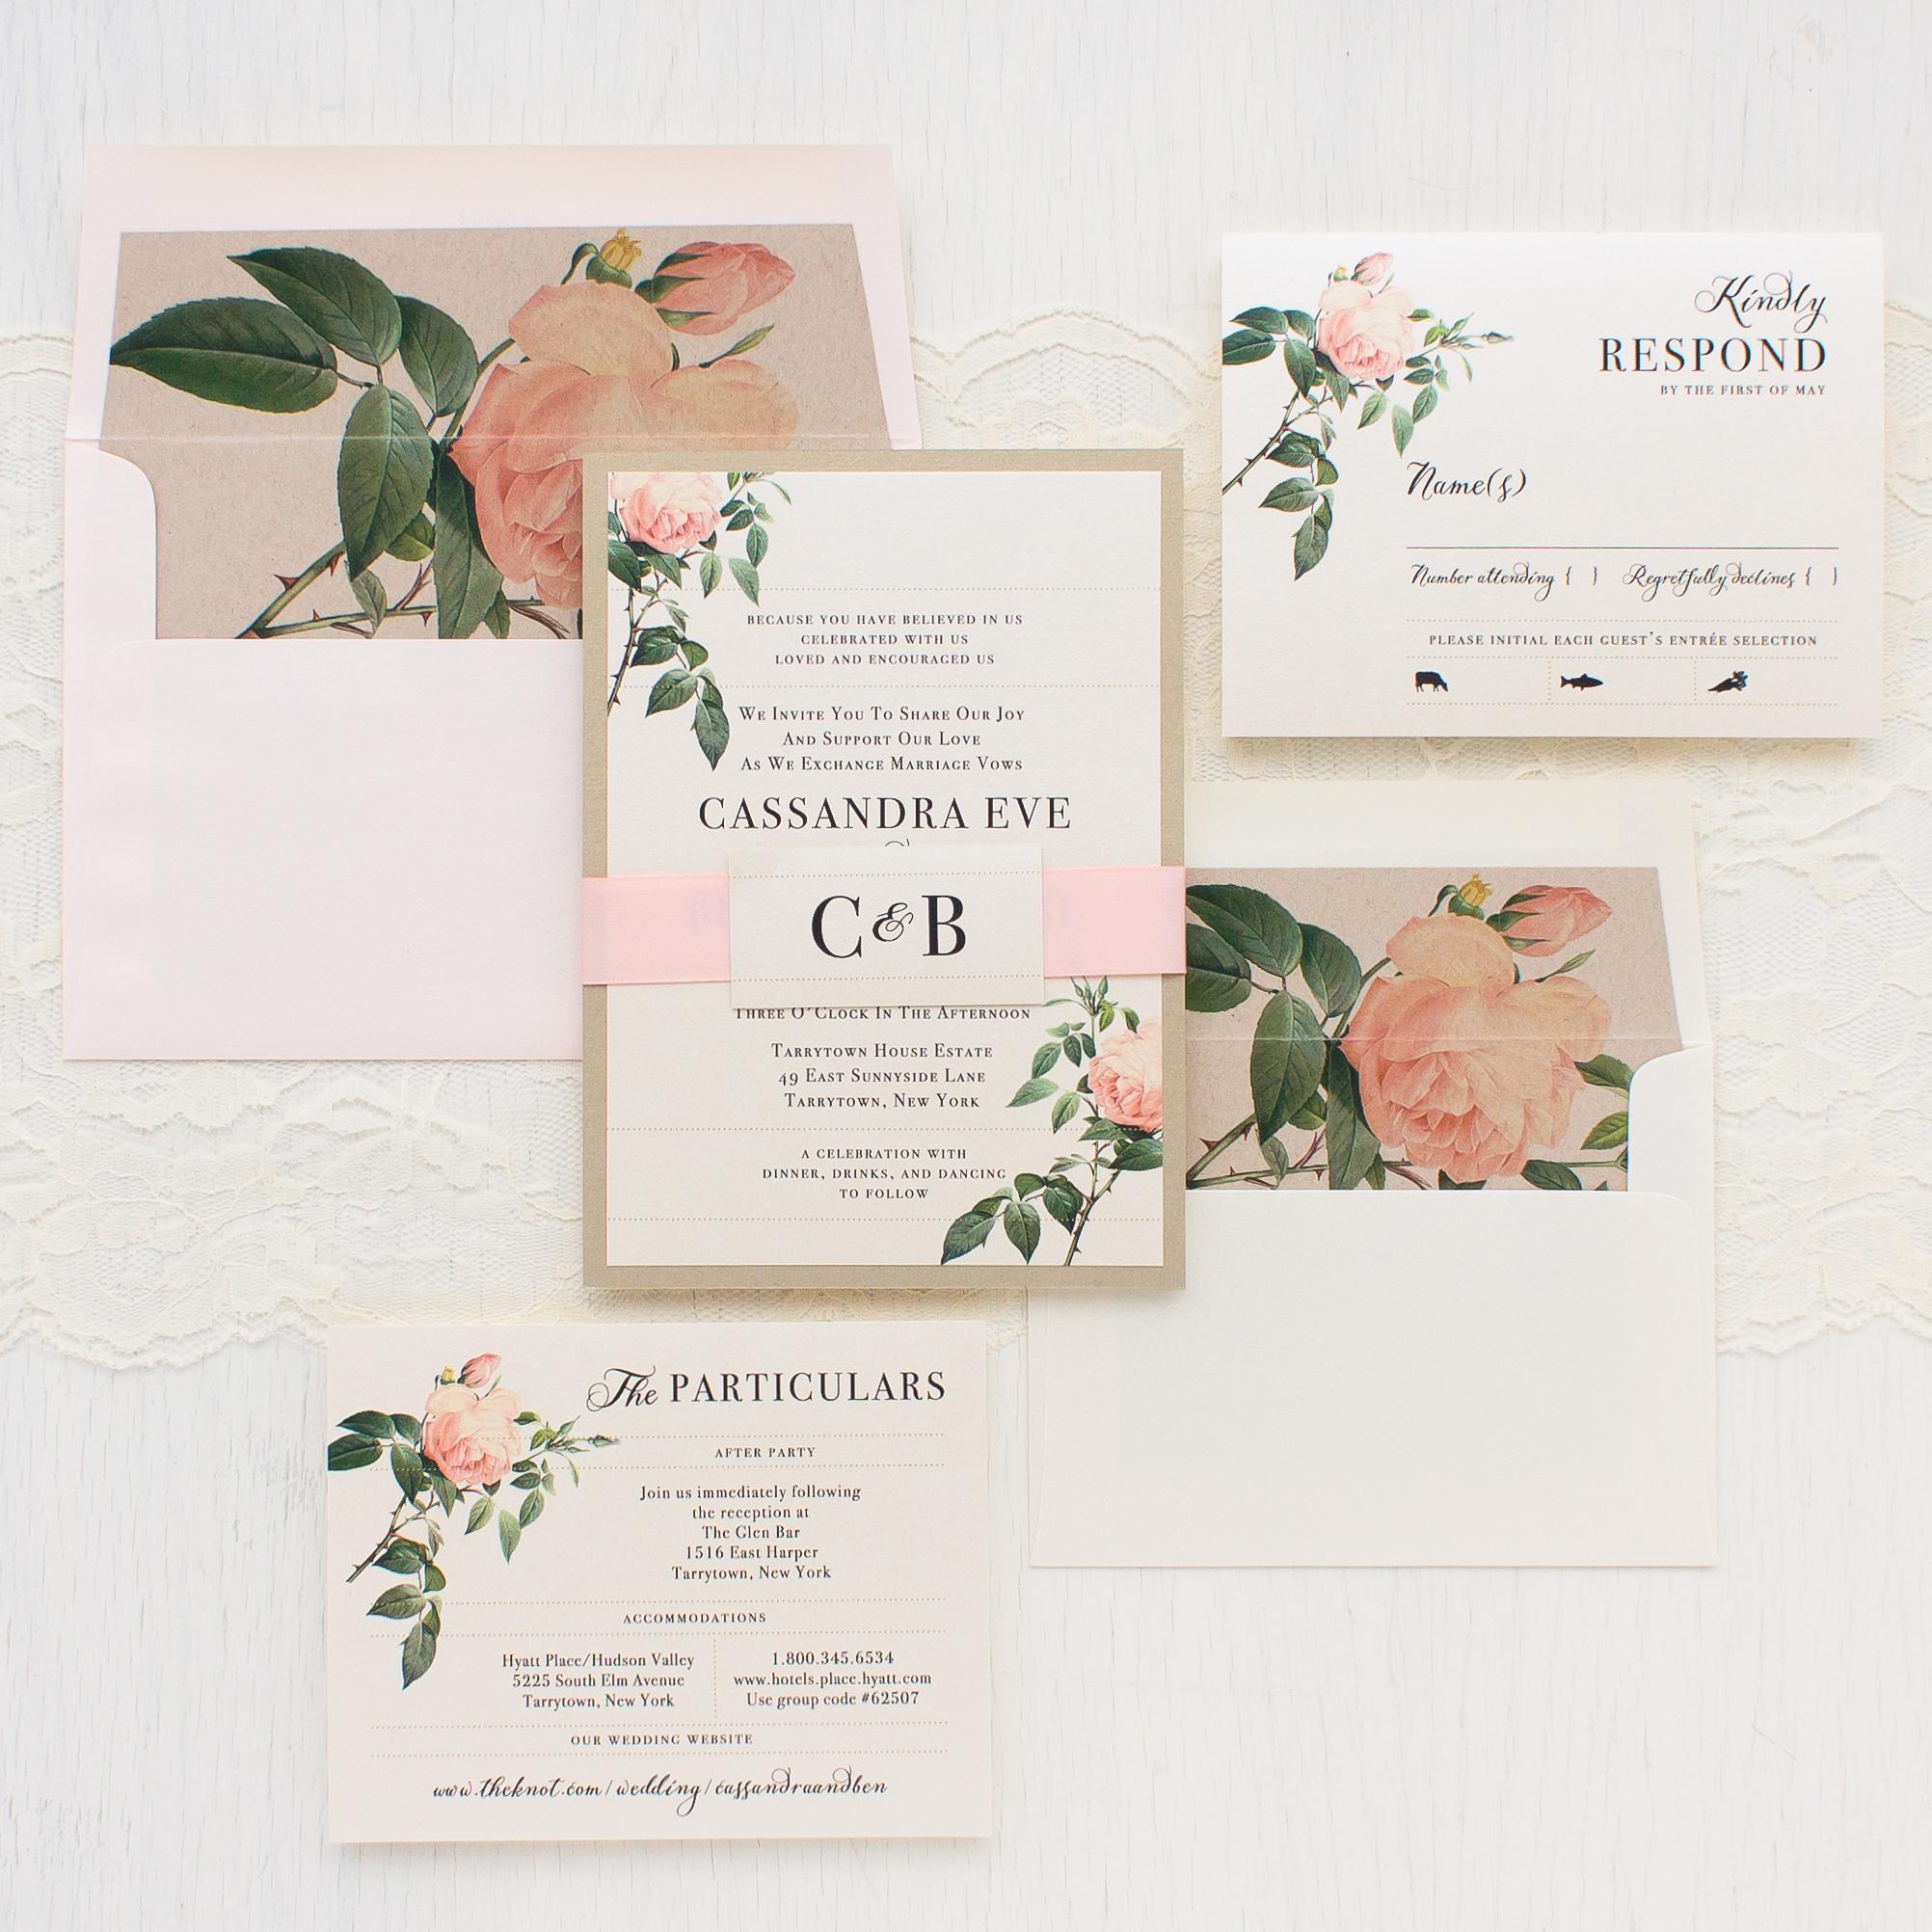 Matching Wedding Day Stationery: Ivory and Blush | Beacon Lane